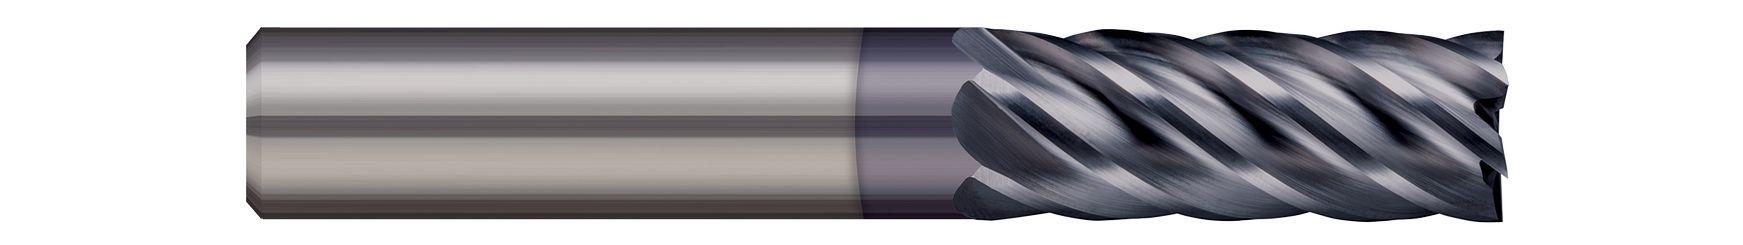 tool-details-EMH-750-06X